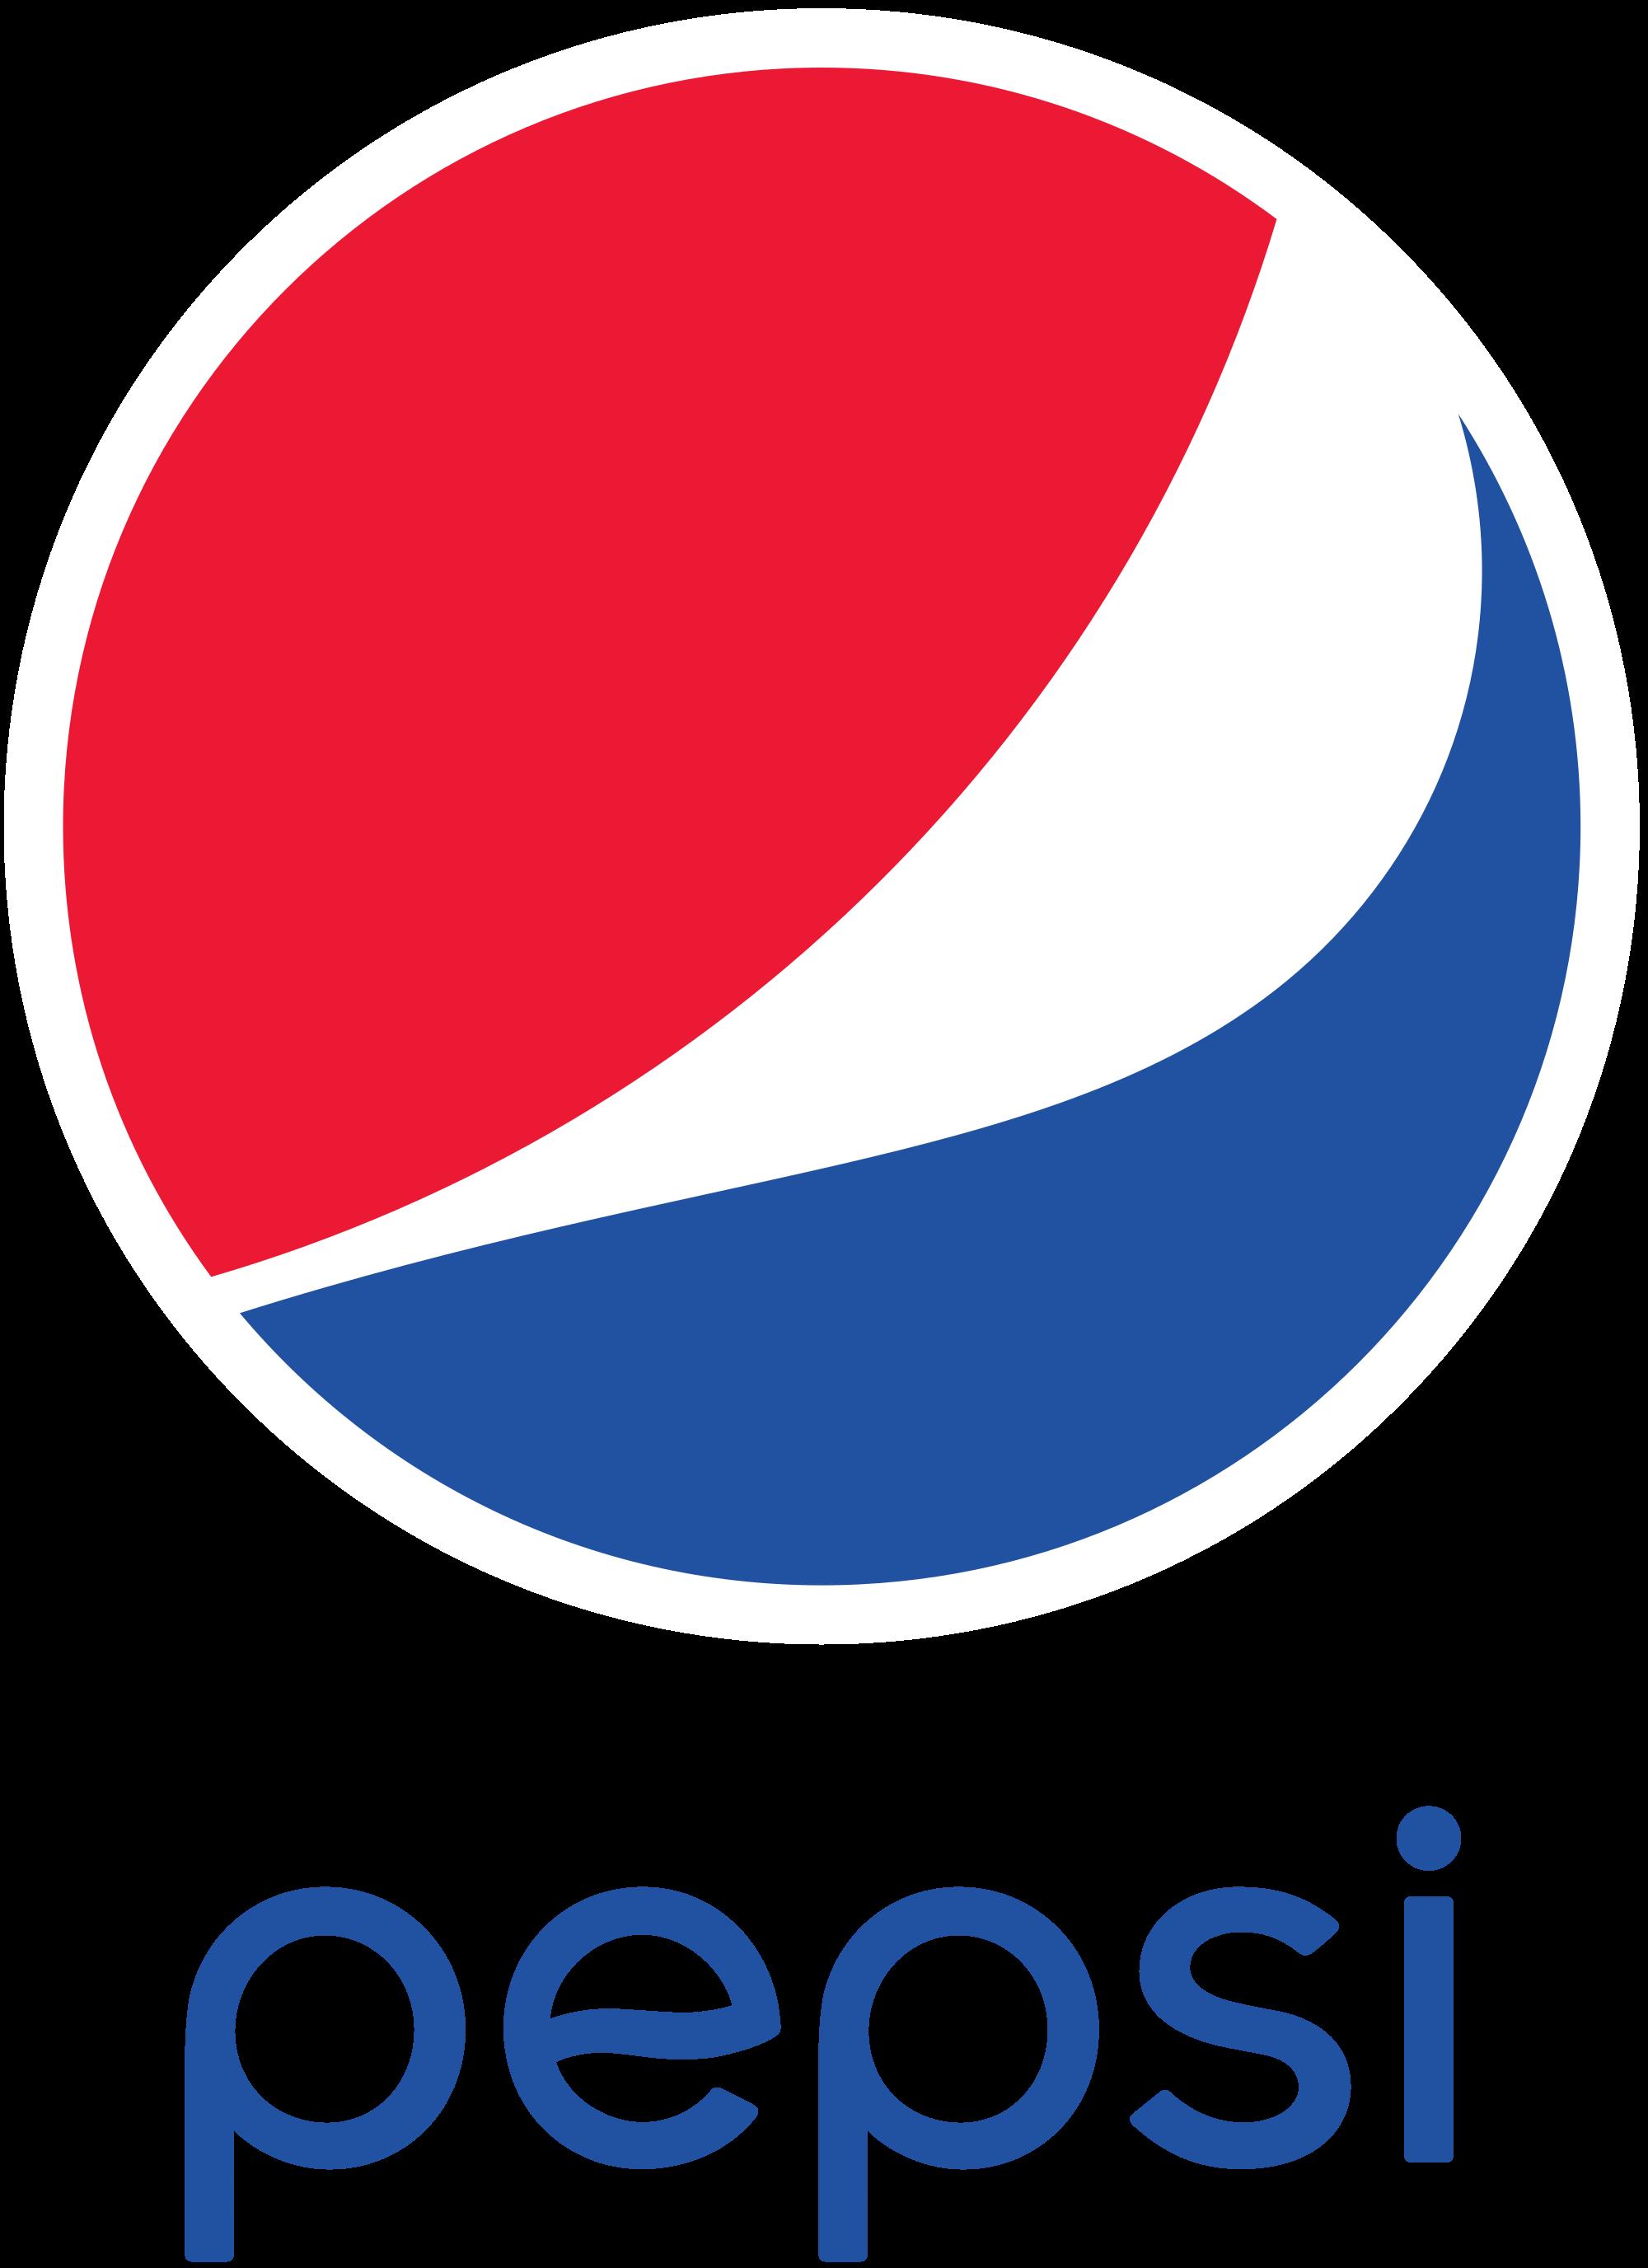 2000px-Pepsi_logo_2014.svg